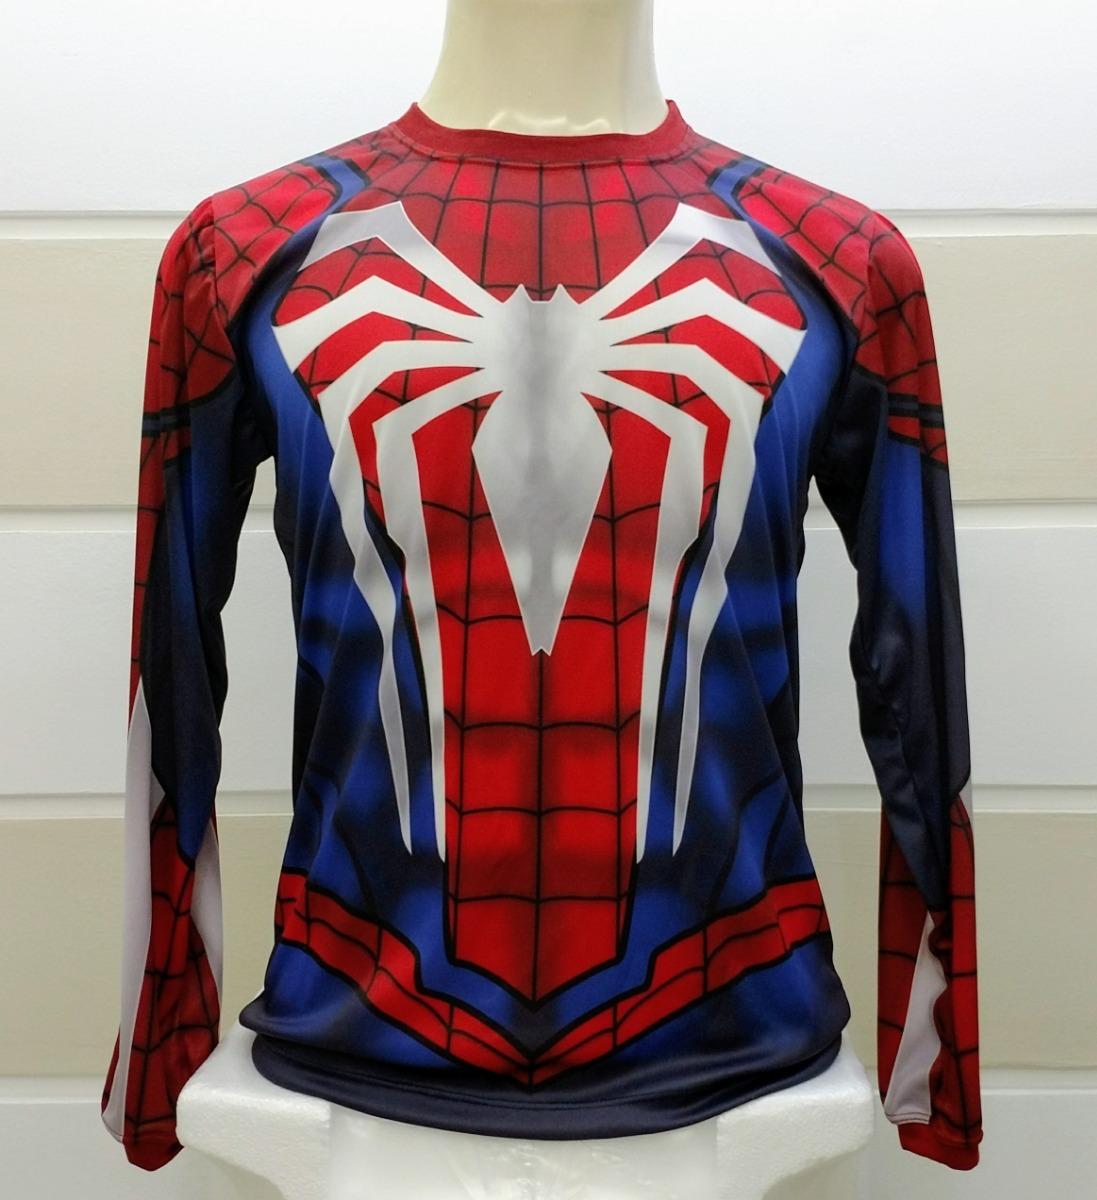 e375e3ae4 camiseta homem aranha game ps4 manga longa. Carregando zoom.